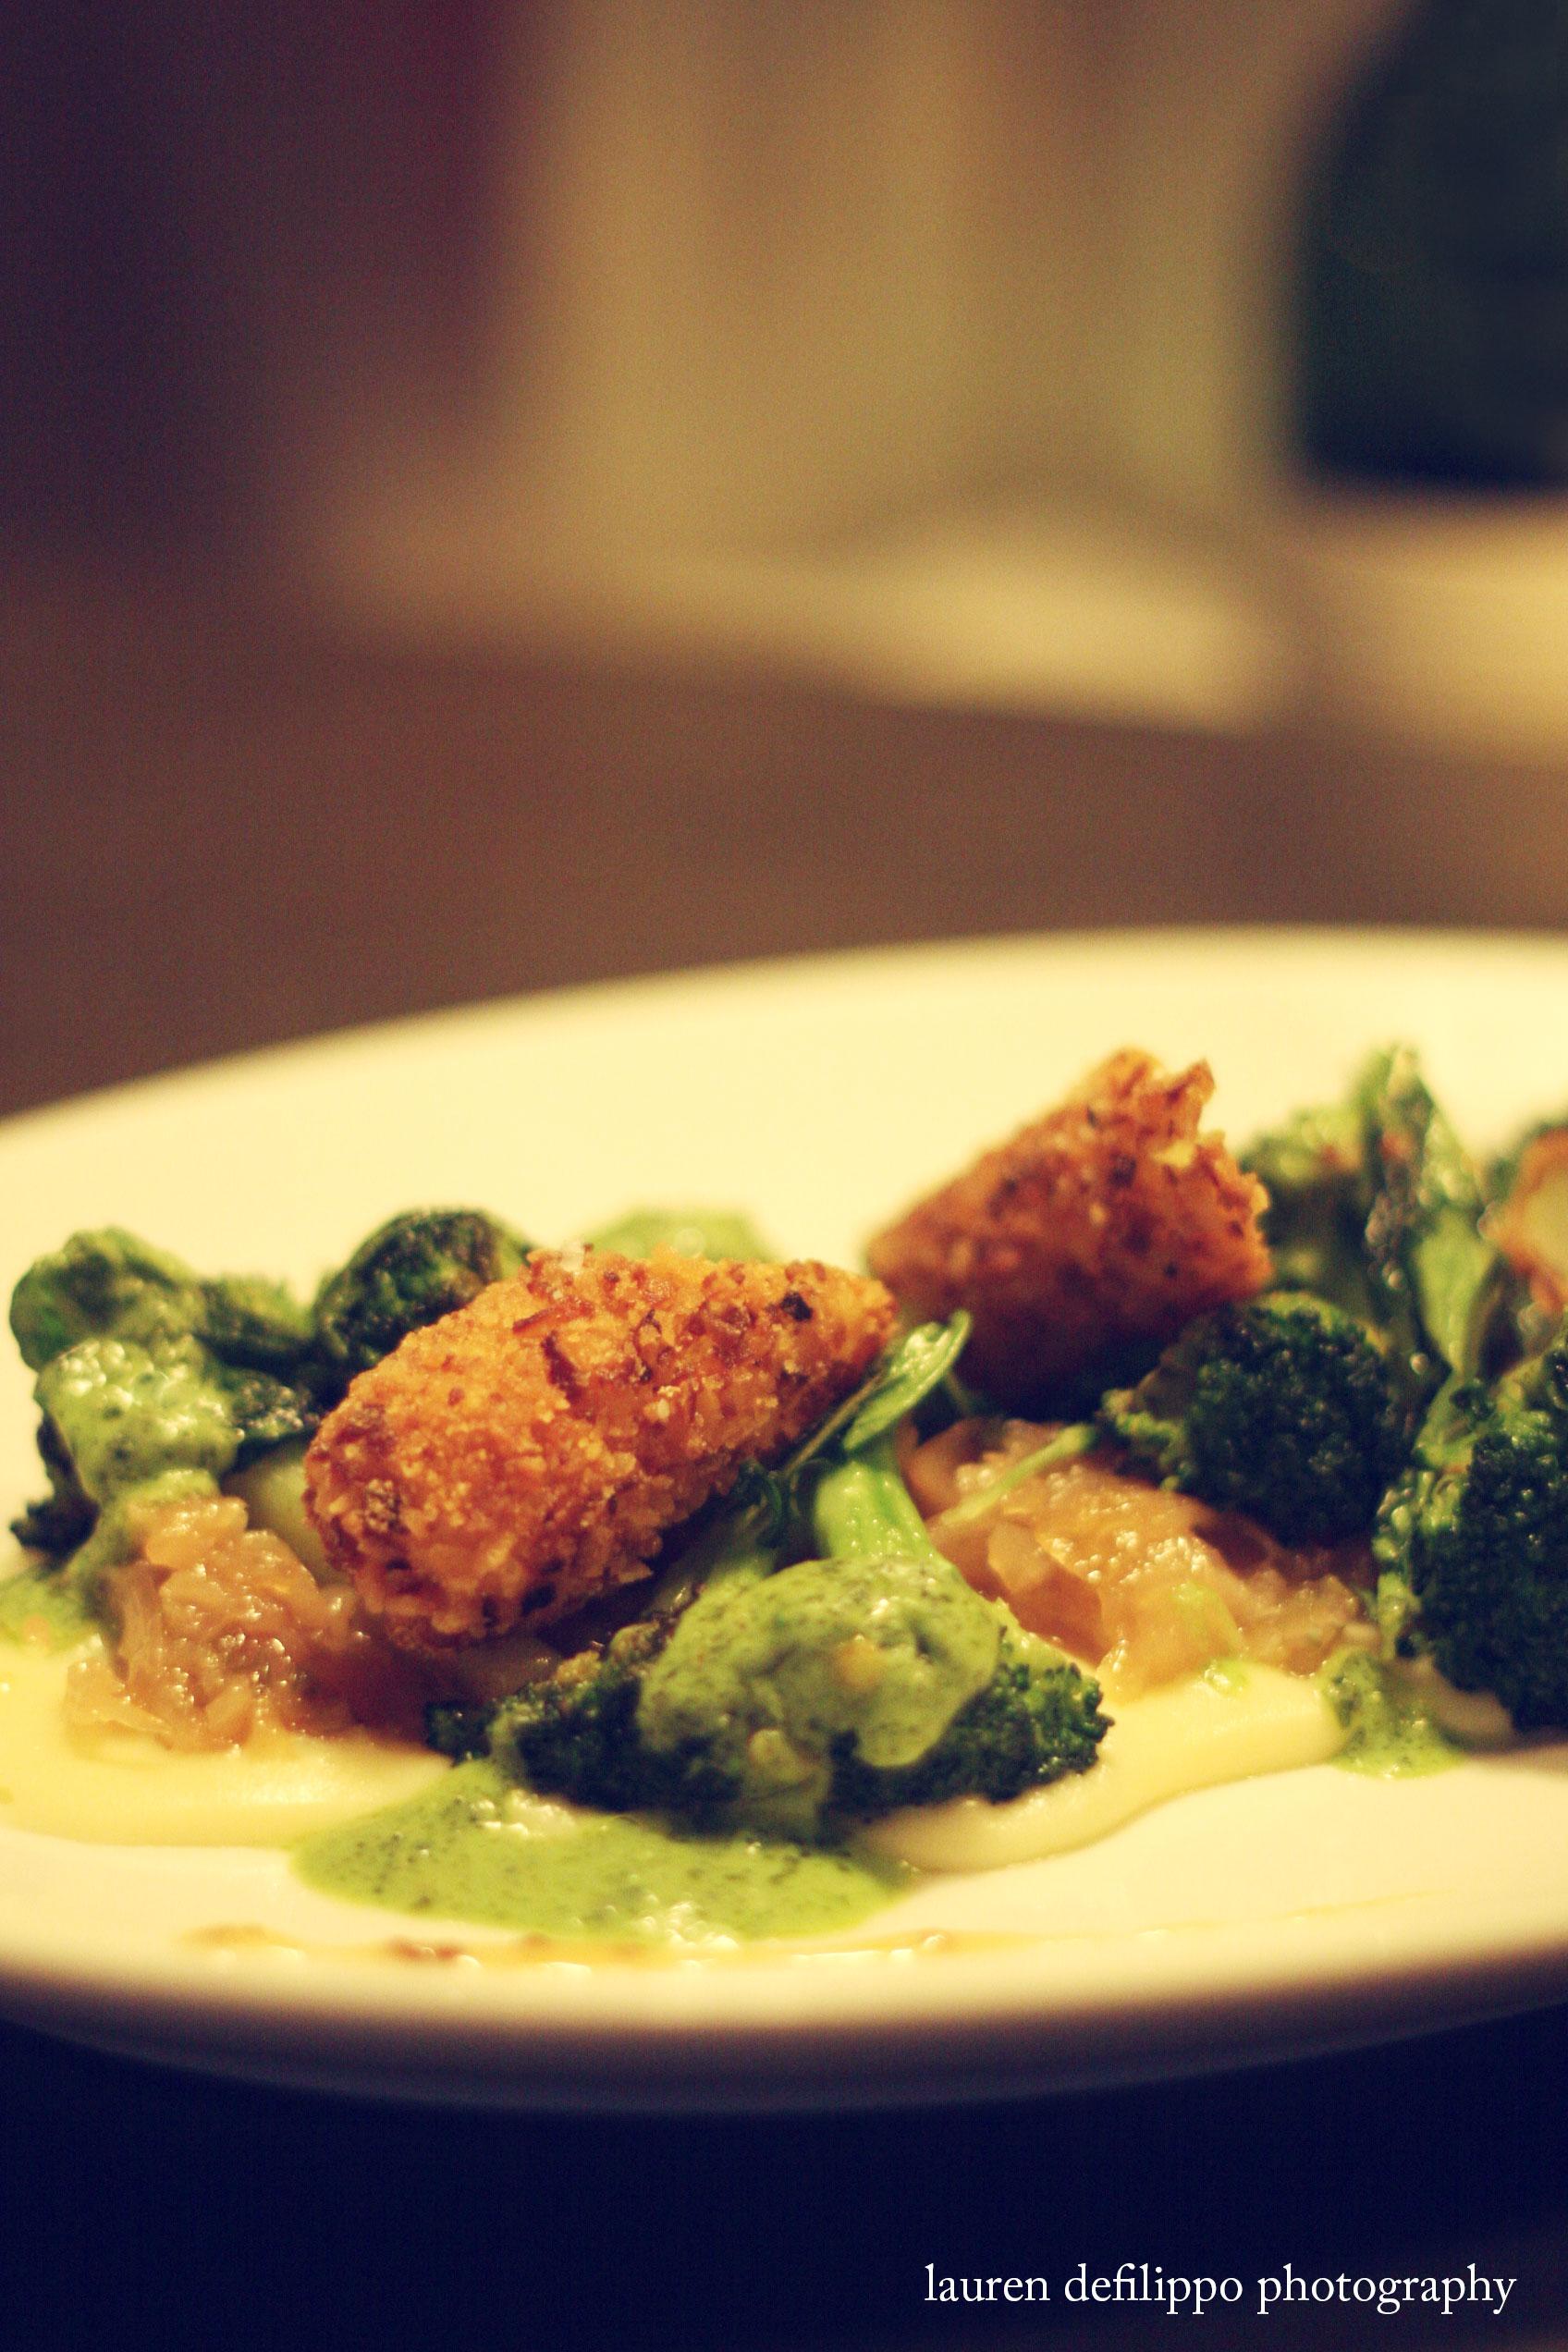 Broccoli with cabbage, mustard, pretzel